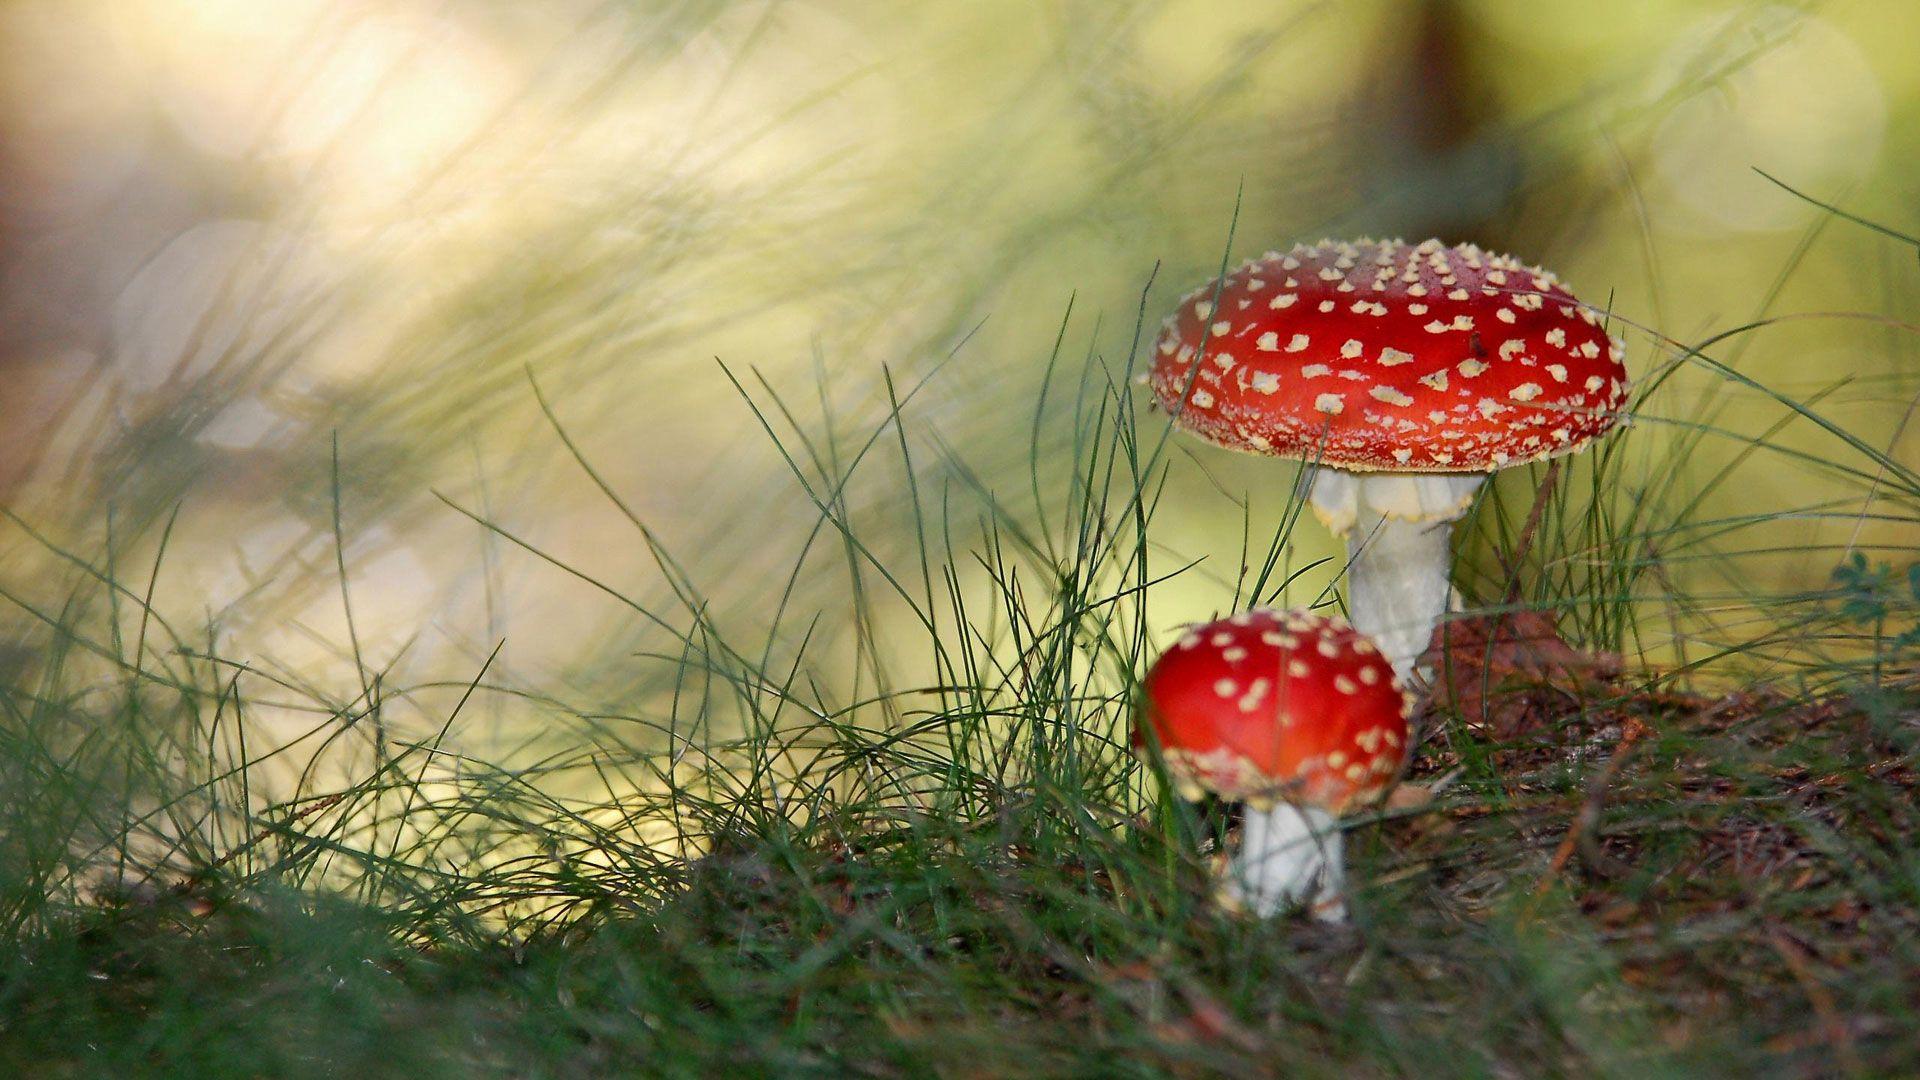 Http Www Hdwallpapers In Walls Small Mushrooms Hd Jpg Stuffed Mushrooms Mushroom Wallpaper Poisonous Plants